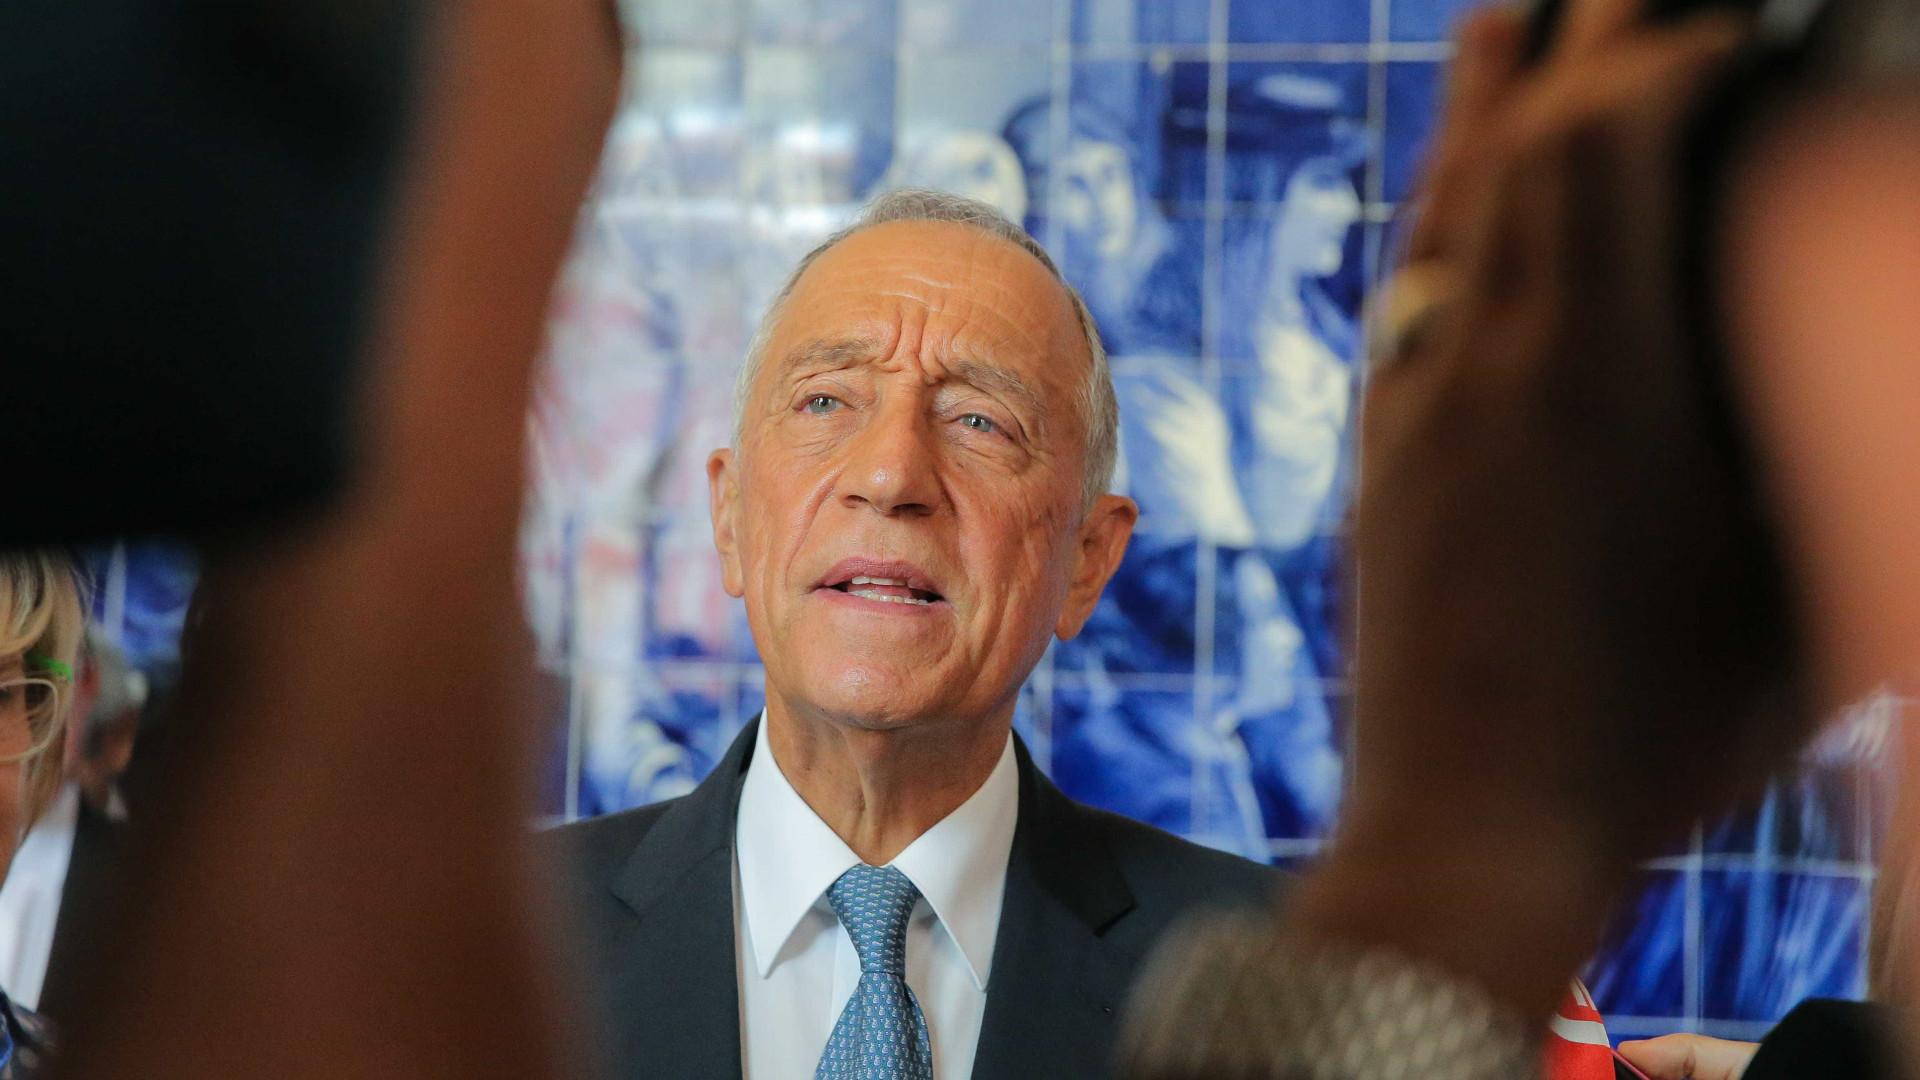 Presidente condecora António Barreto, Lurdes Pintassilgo e Manuel Martins